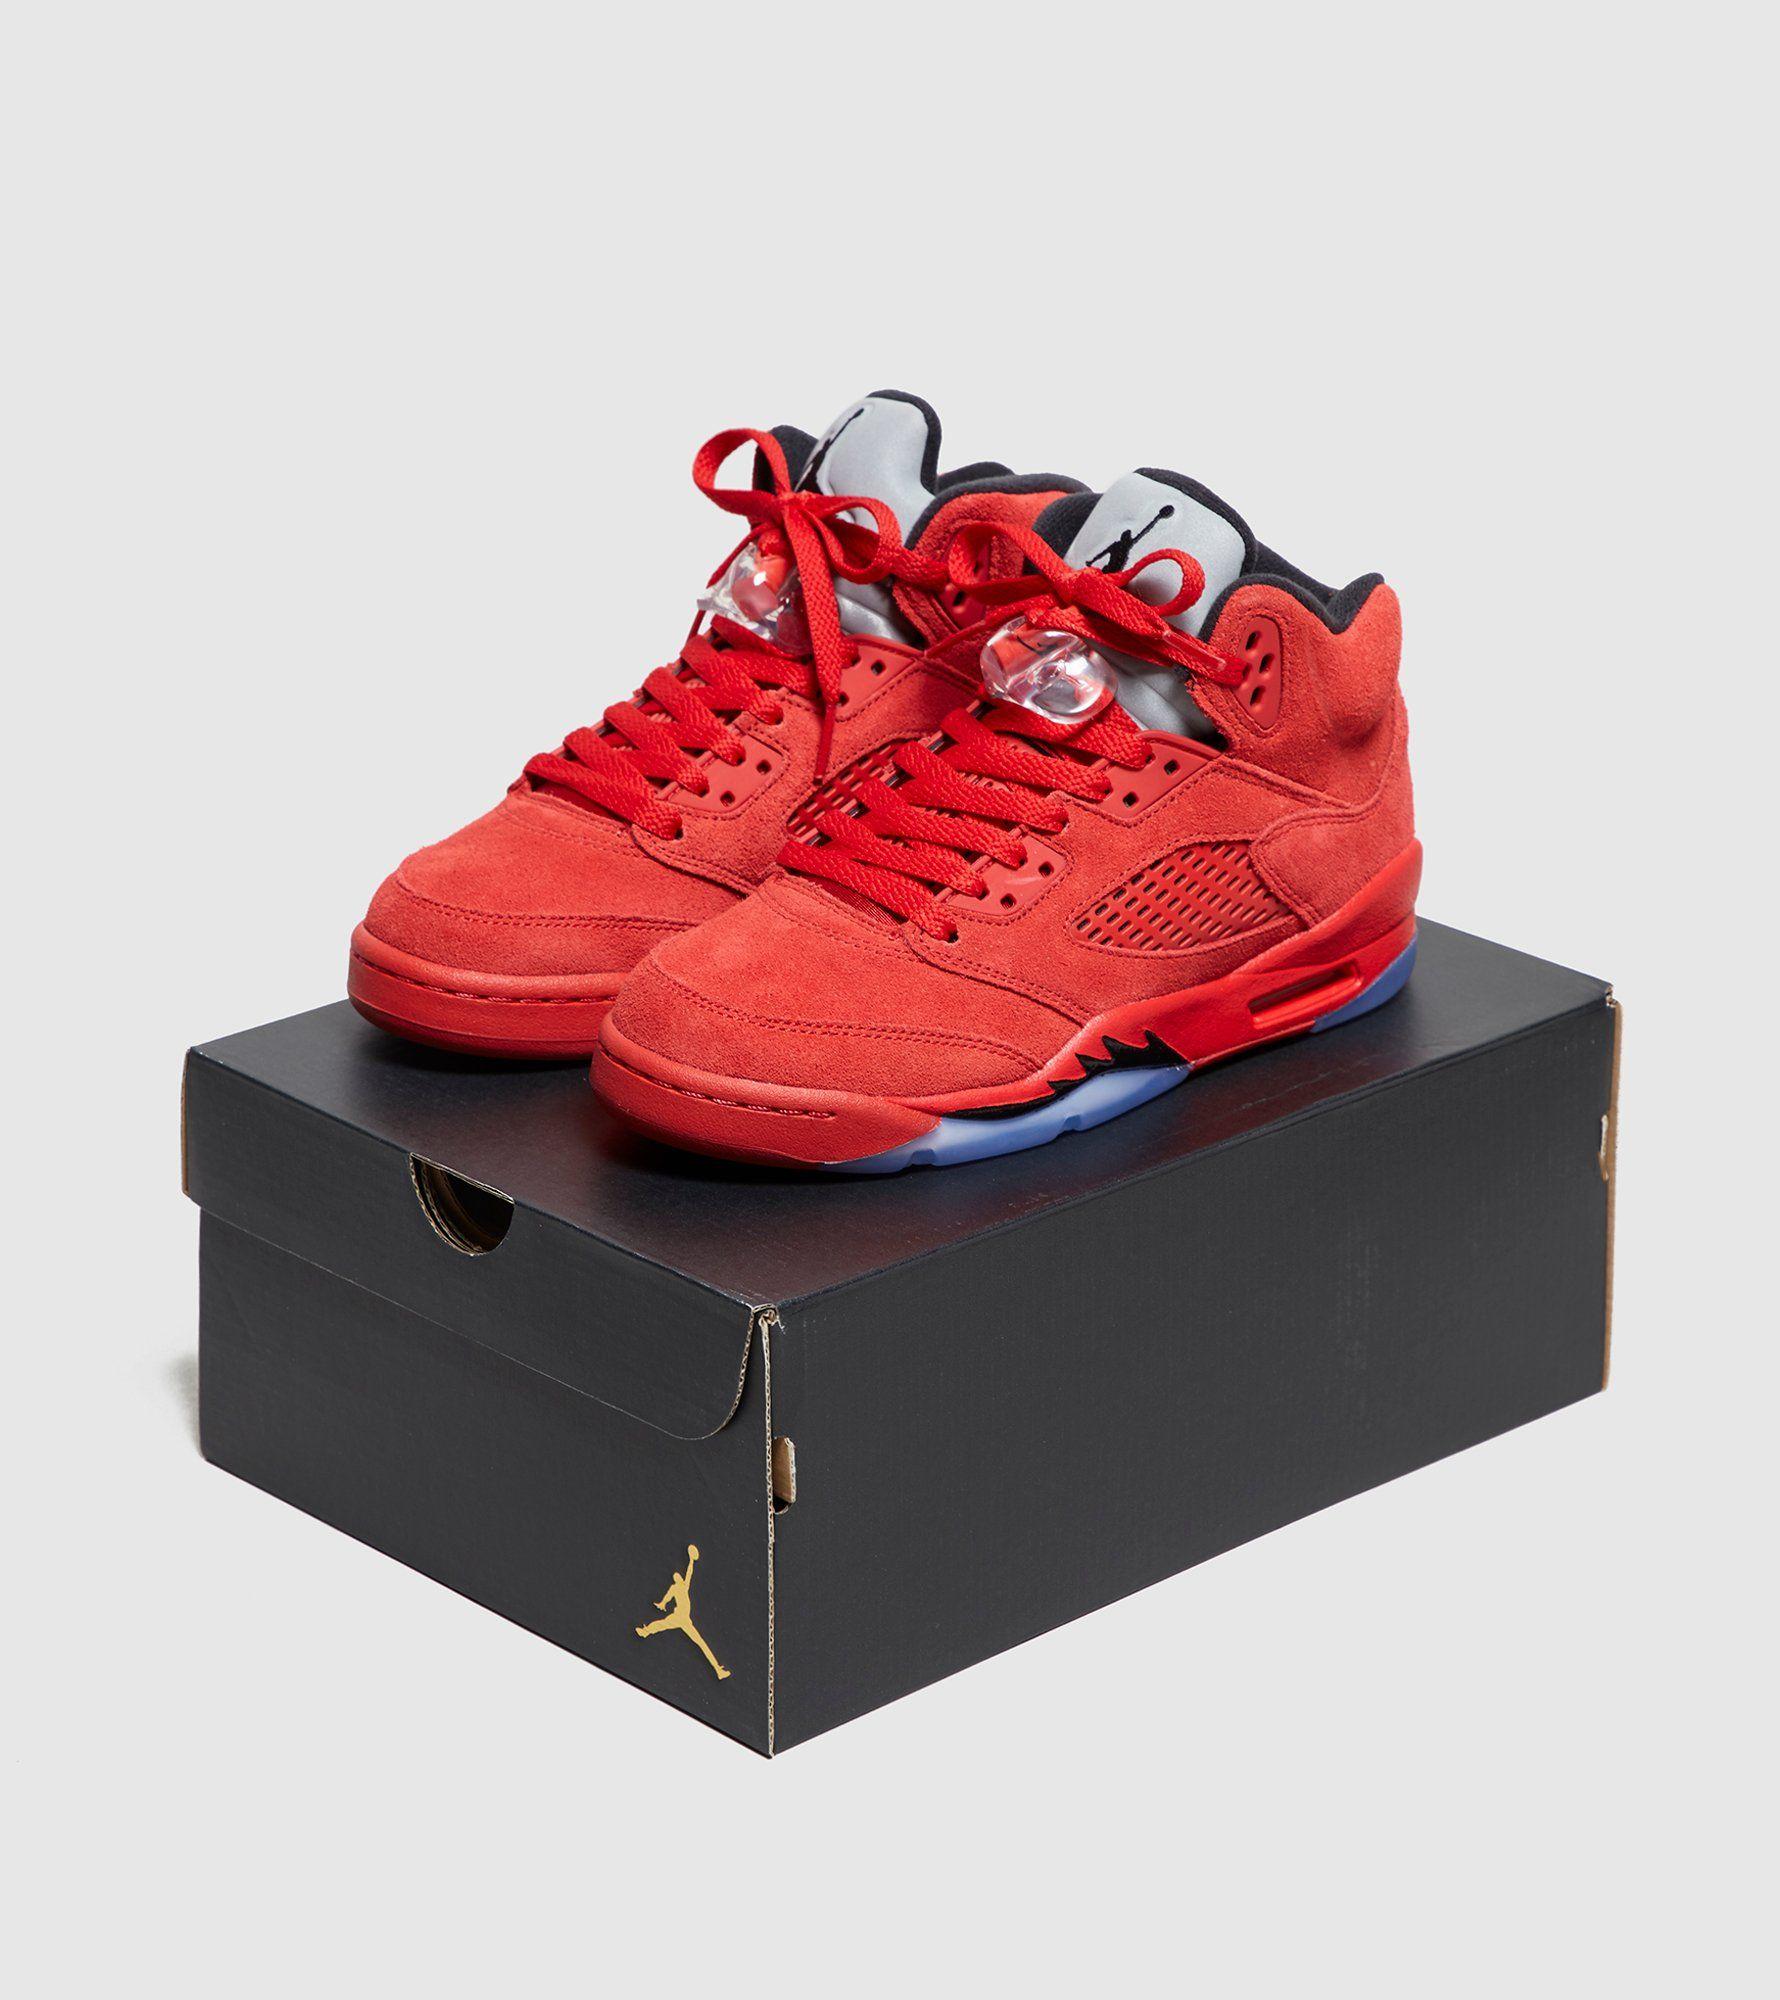 Jordan 5 Retro 'Fire Red' BG